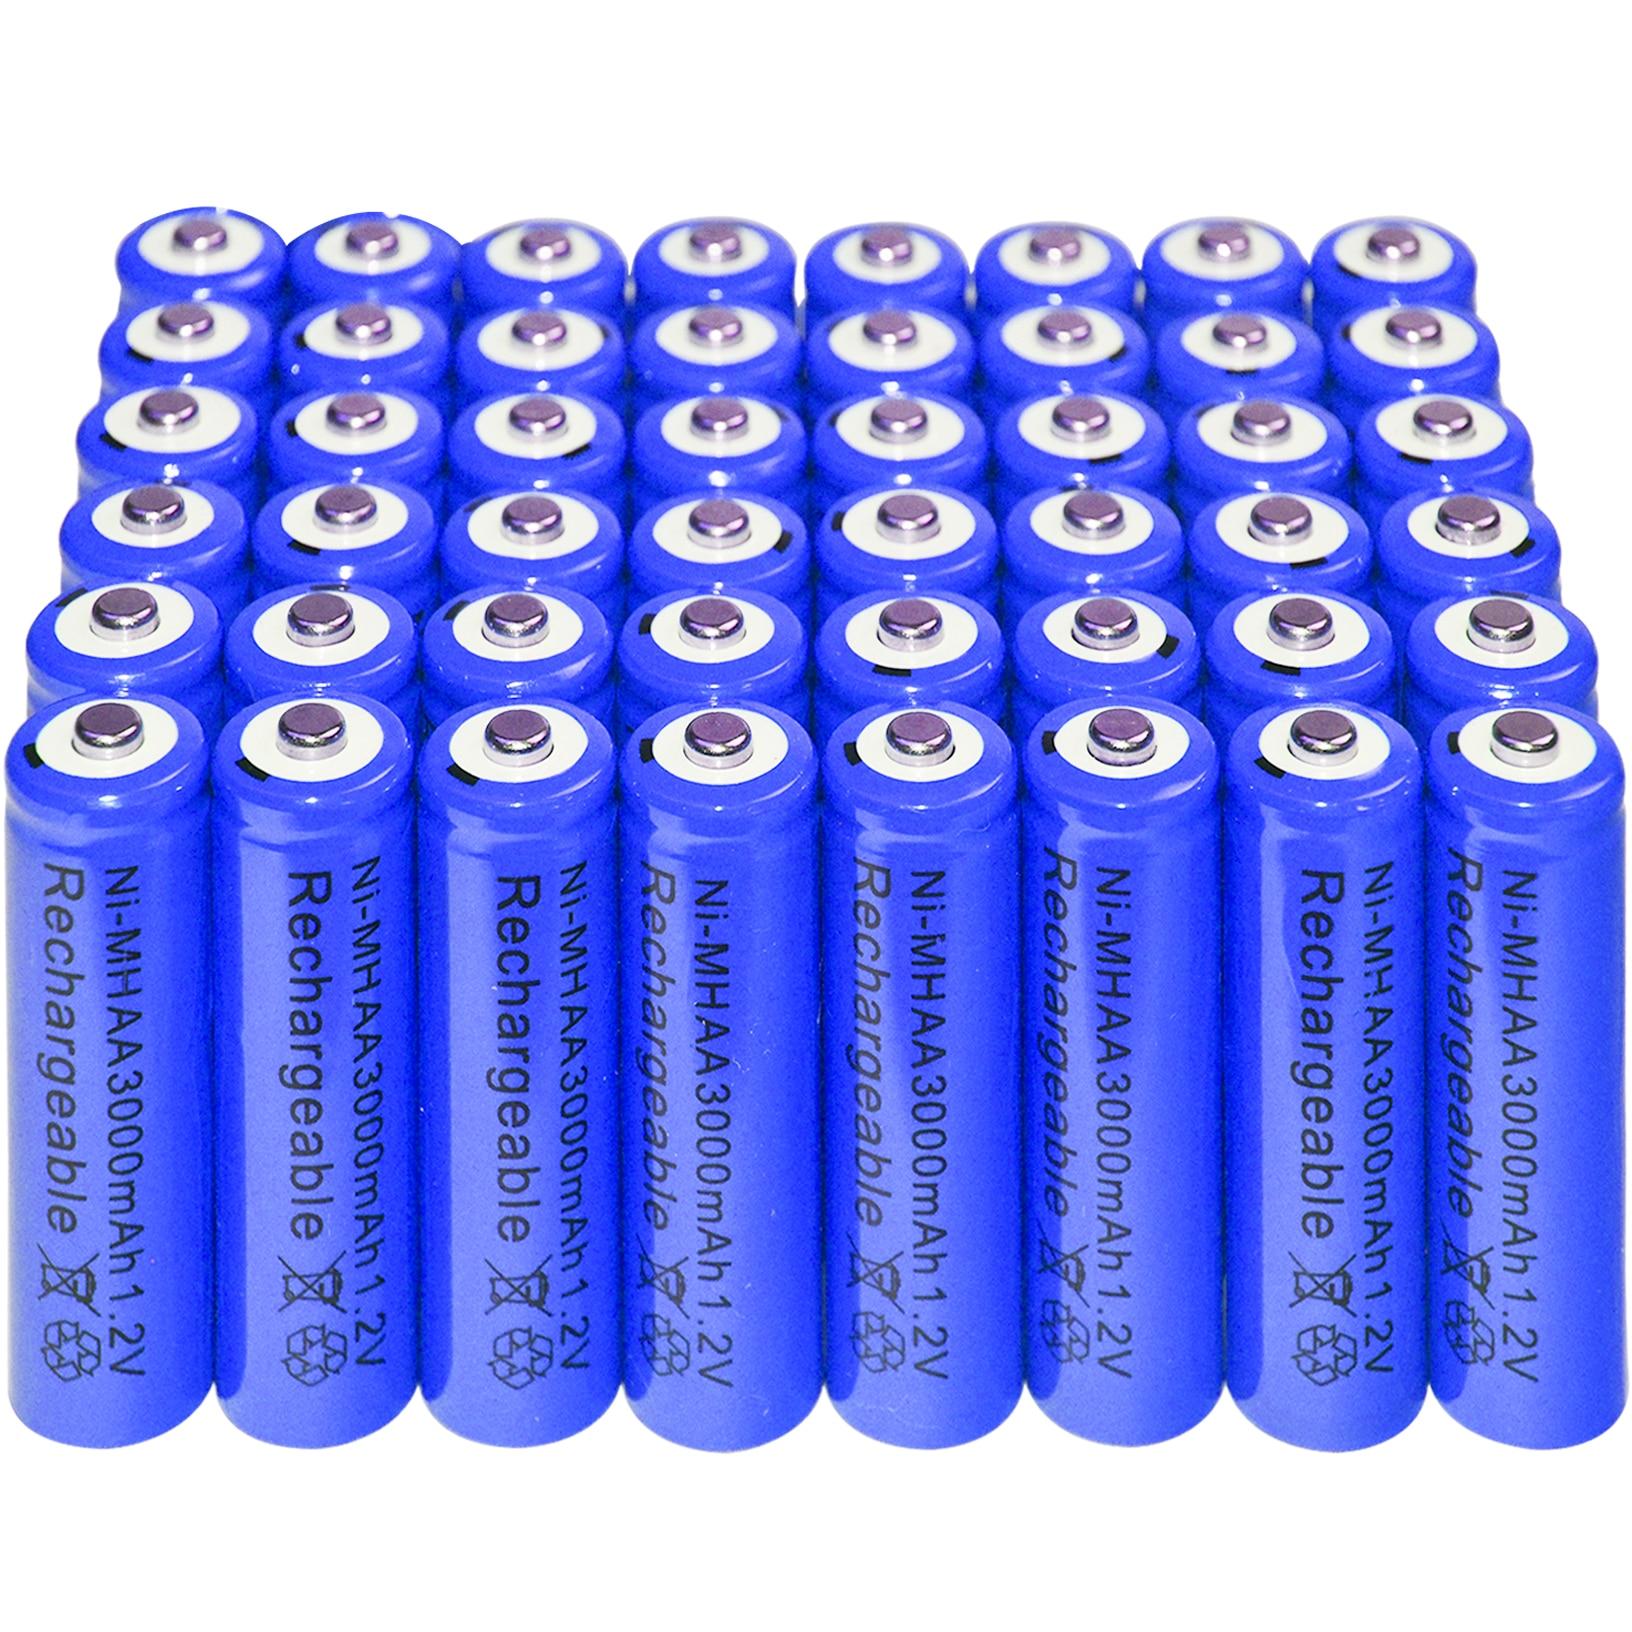 48xAA battery Rechargeable NI-MH 3000mAh 1.2V Blu batteries Bulk Nickel Hydride